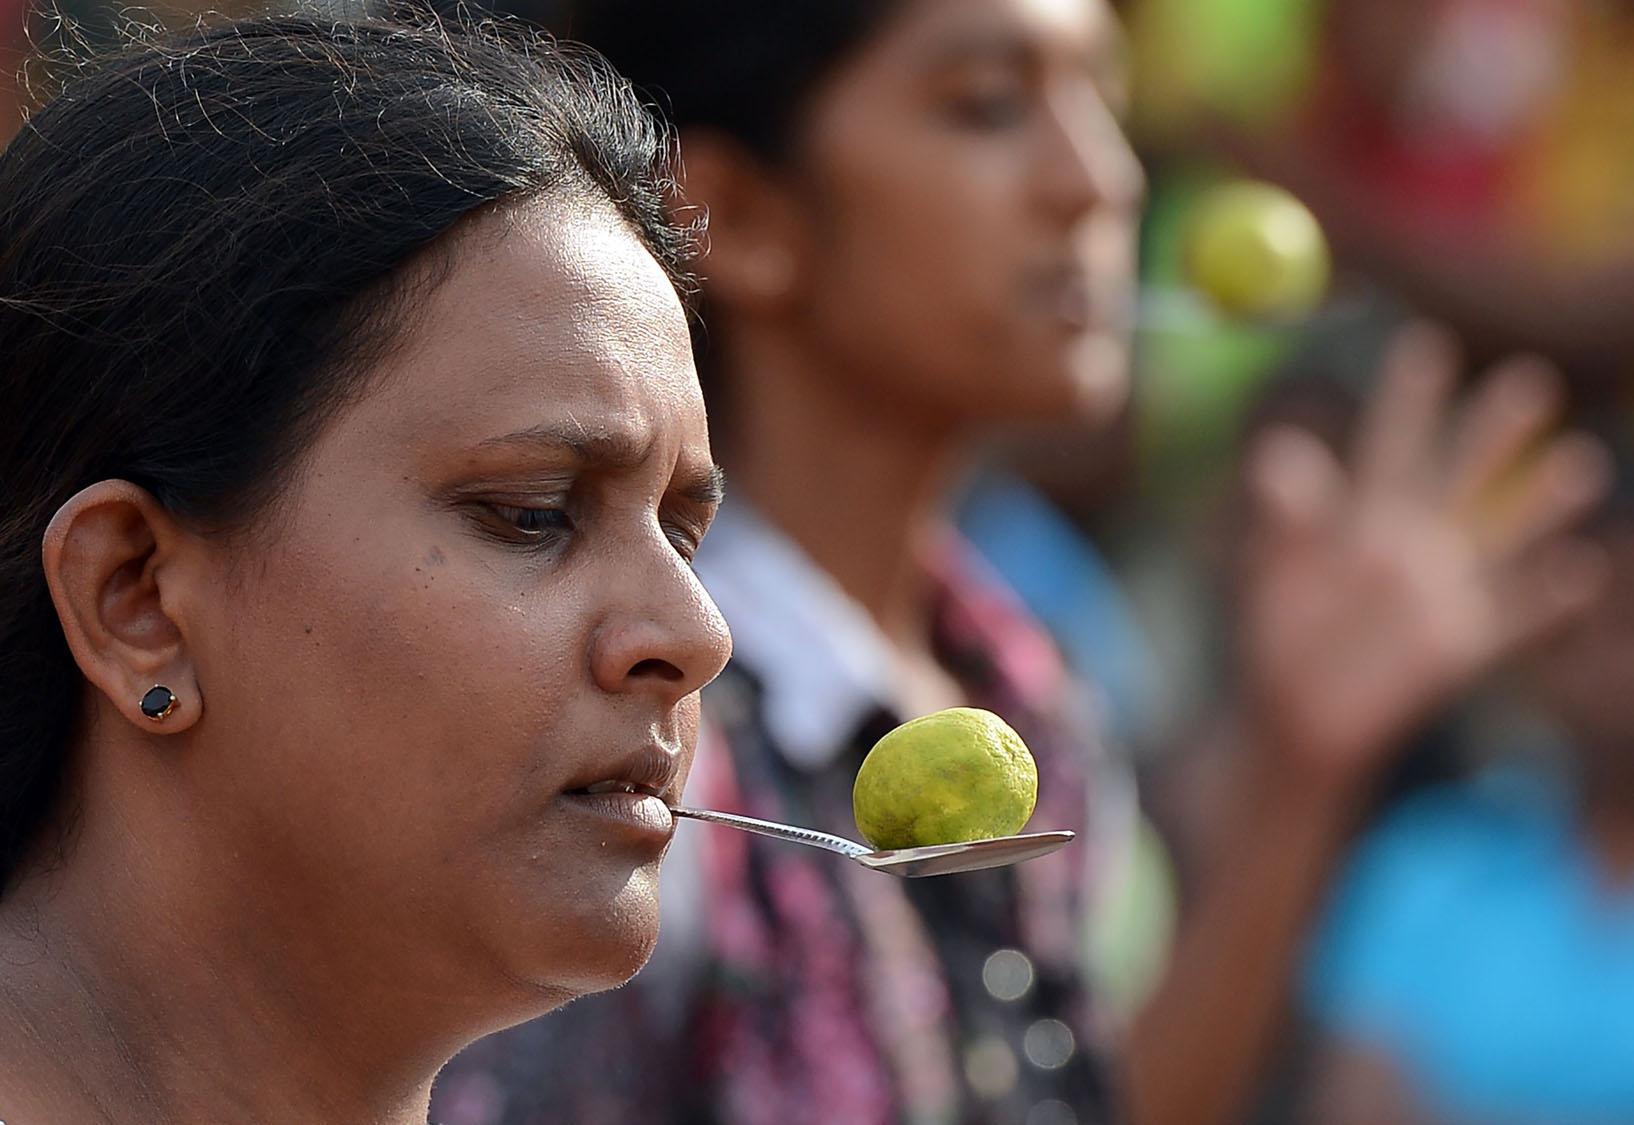 image Sri lankan 19 years old boy vs married woman